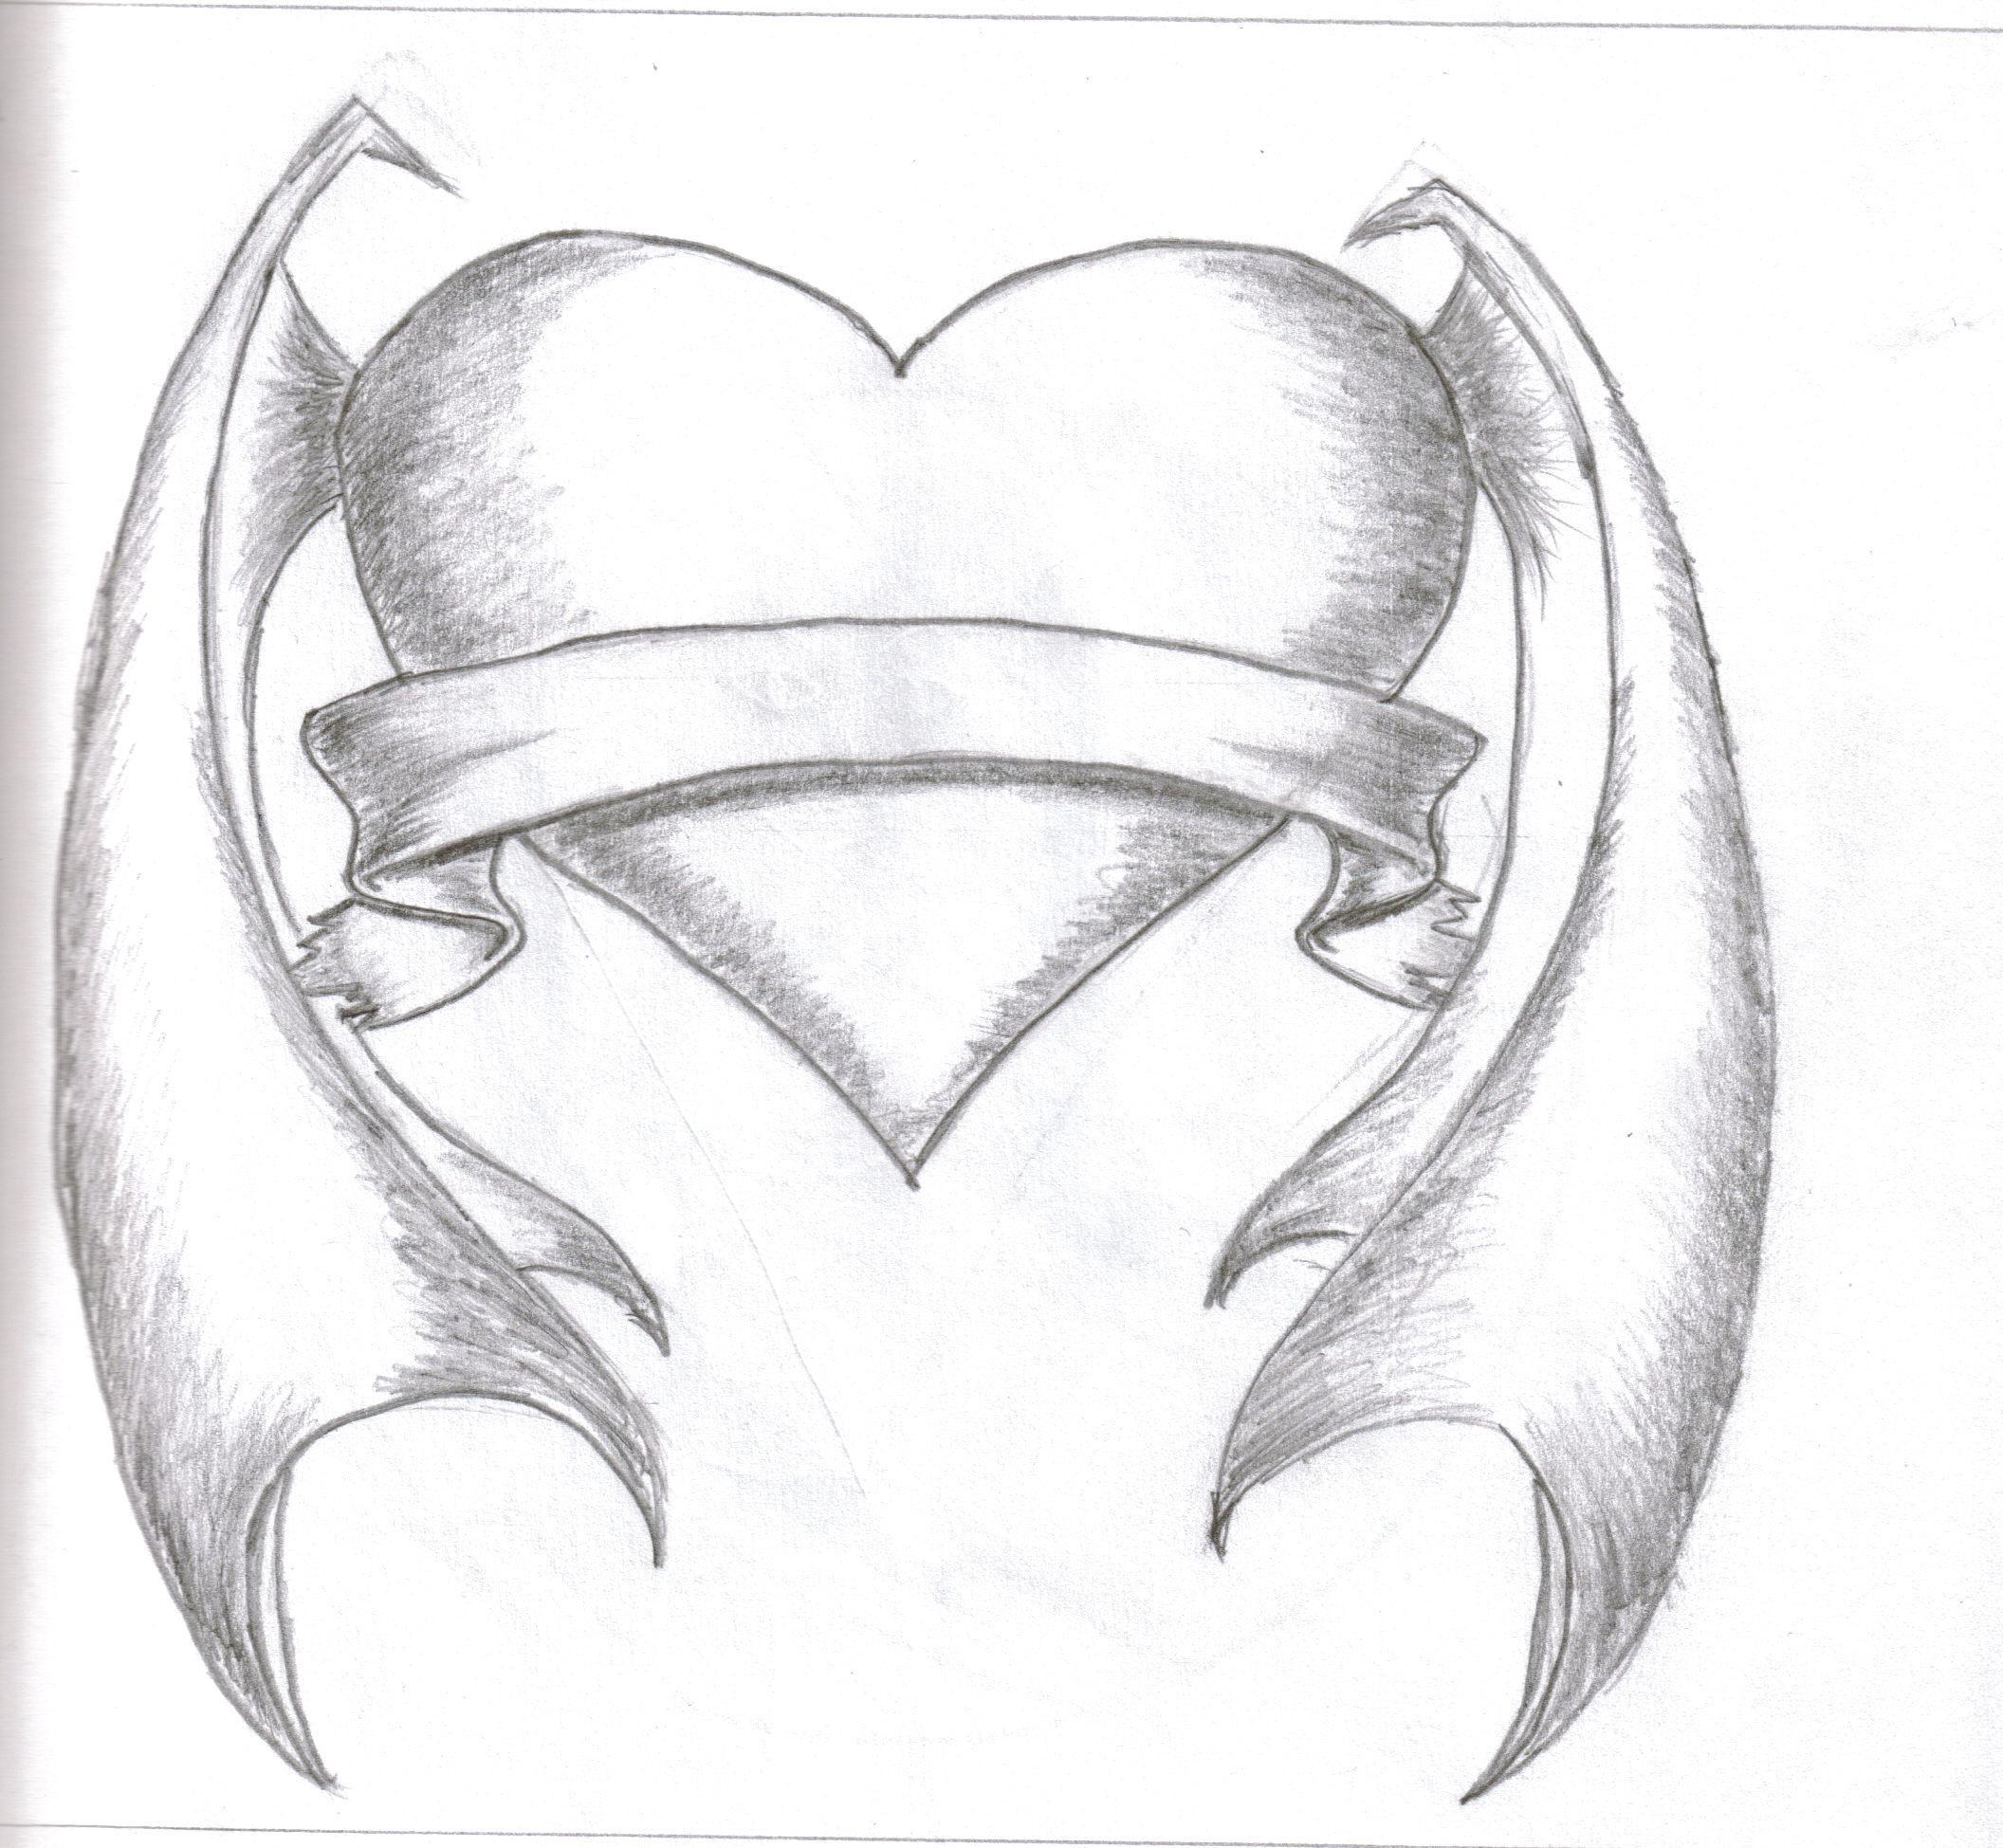 Art Drawings: Free Heart Drawings, Download Free Clip Art, Free Clip Art